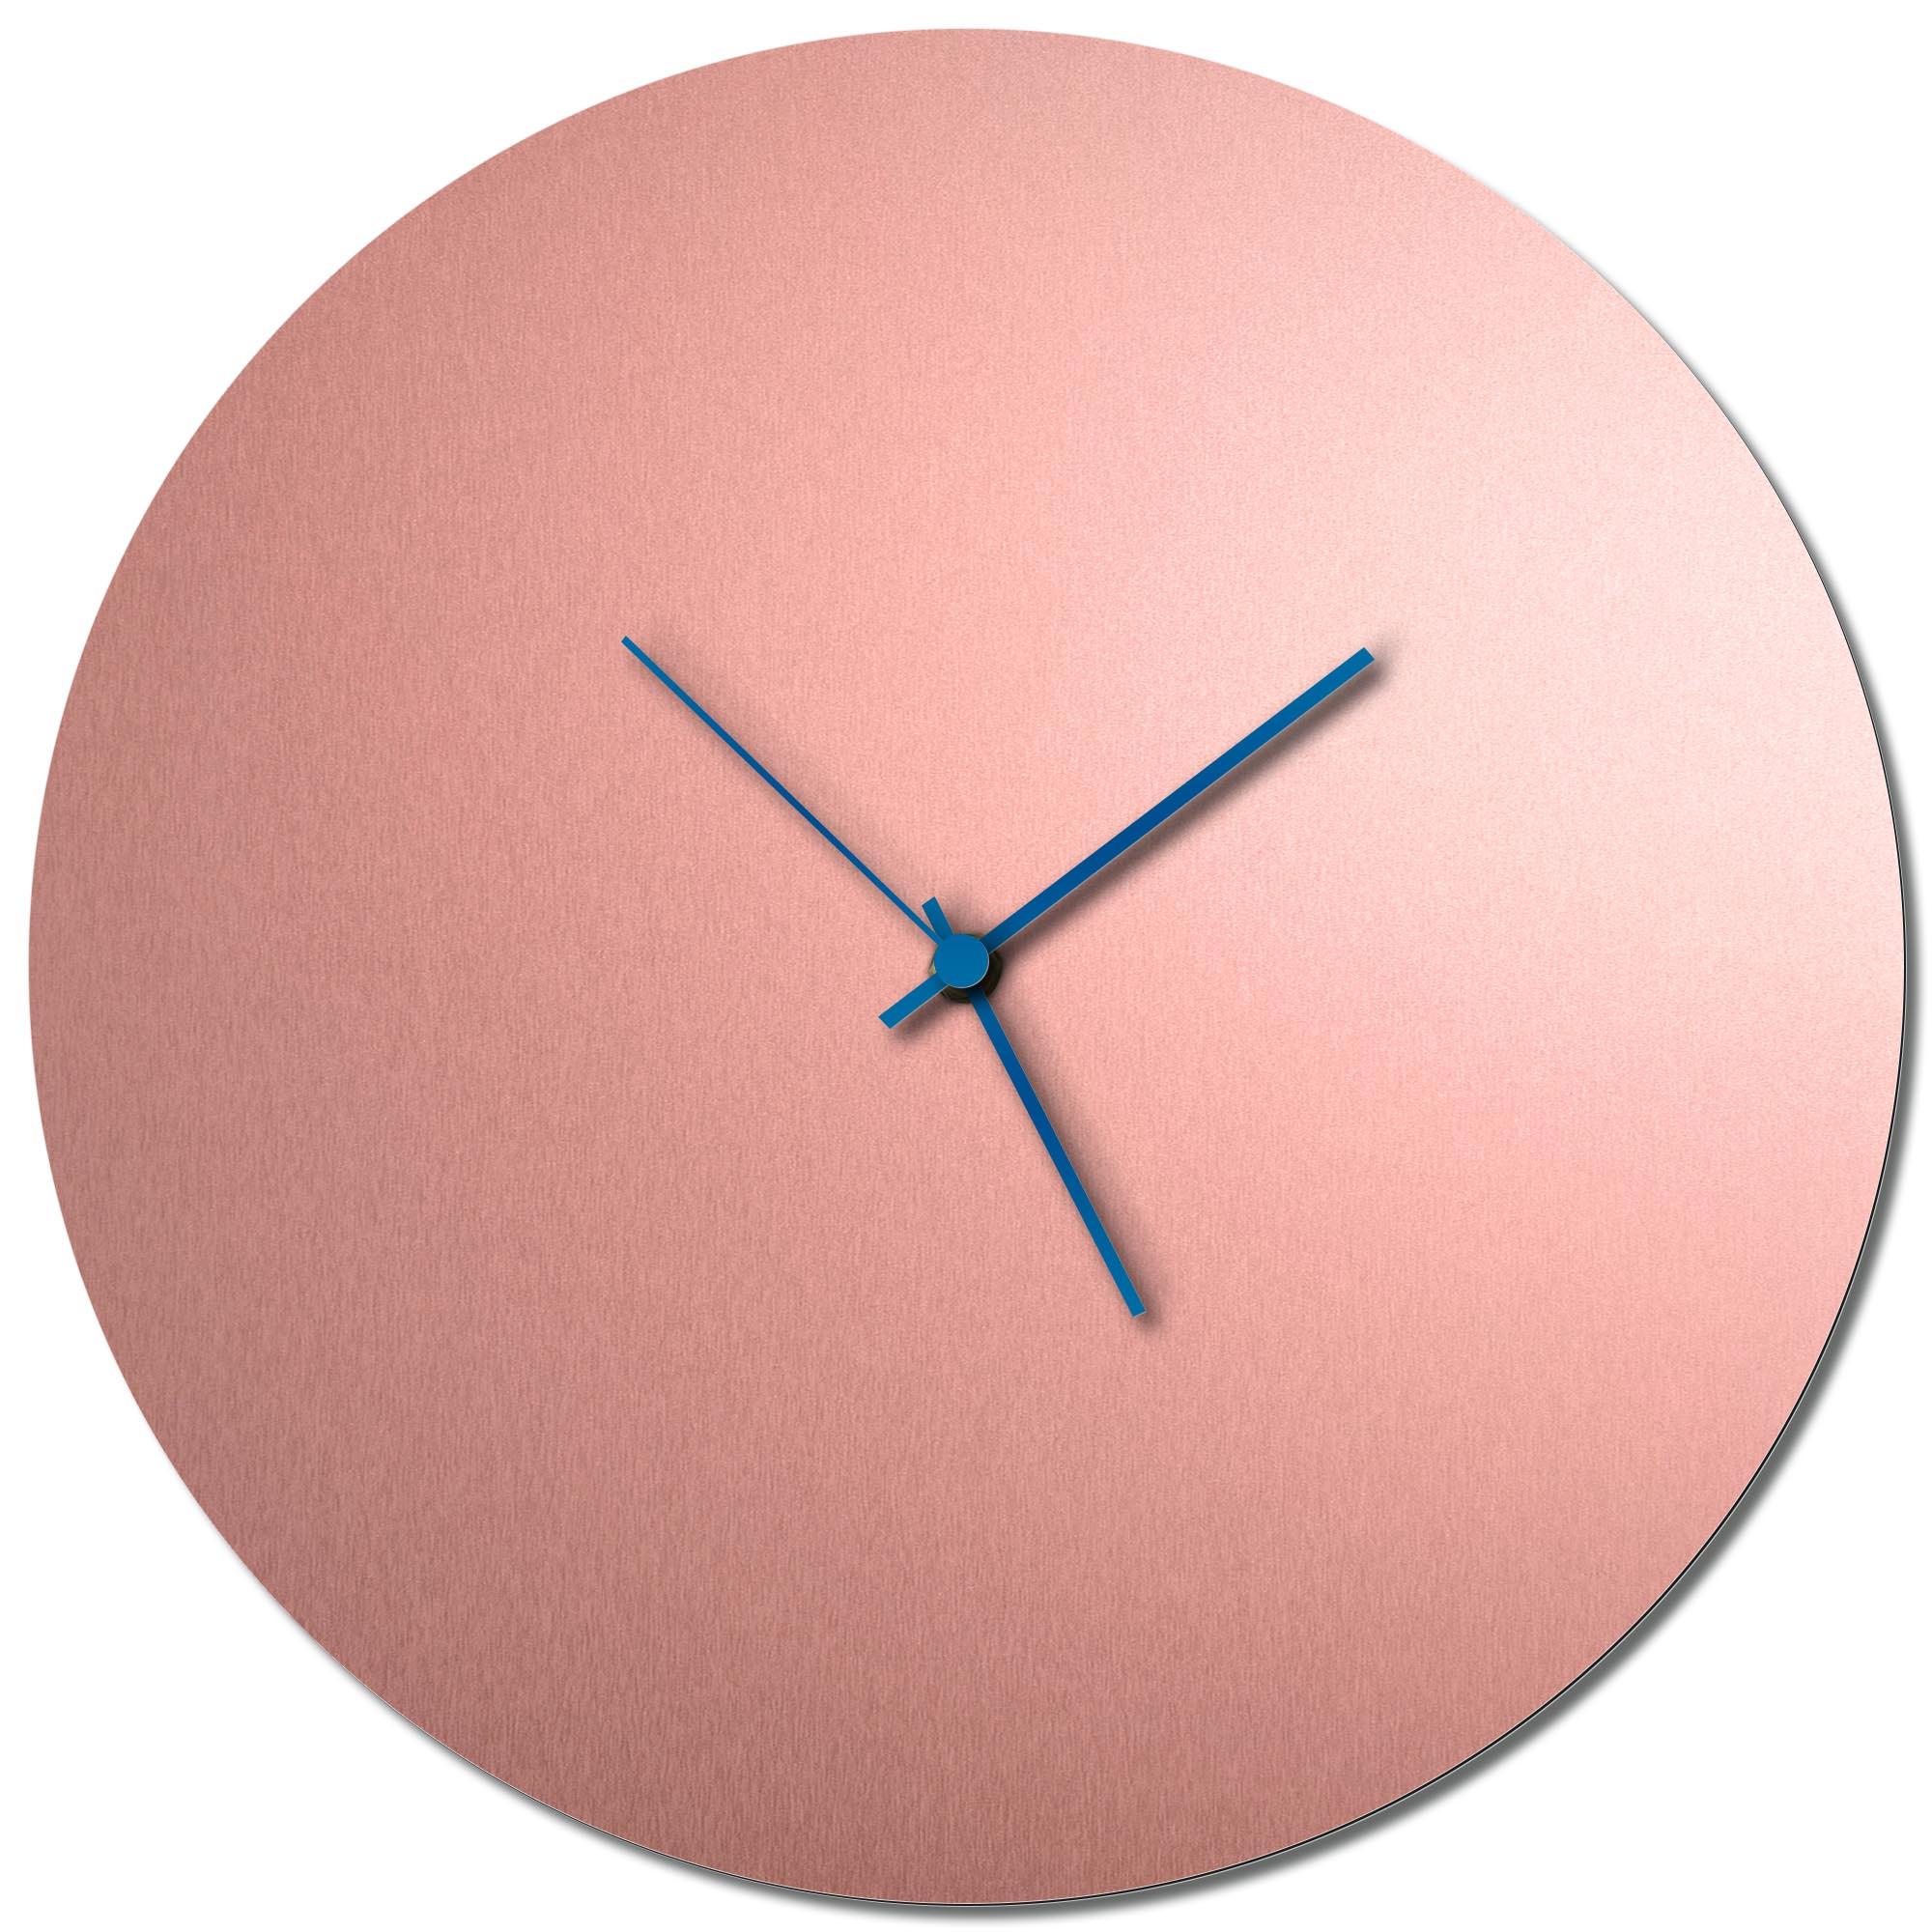 Adam Schwoeppe 'Coppersmith Circle Clock Blue' Midcentury Modern Style Wall Clock